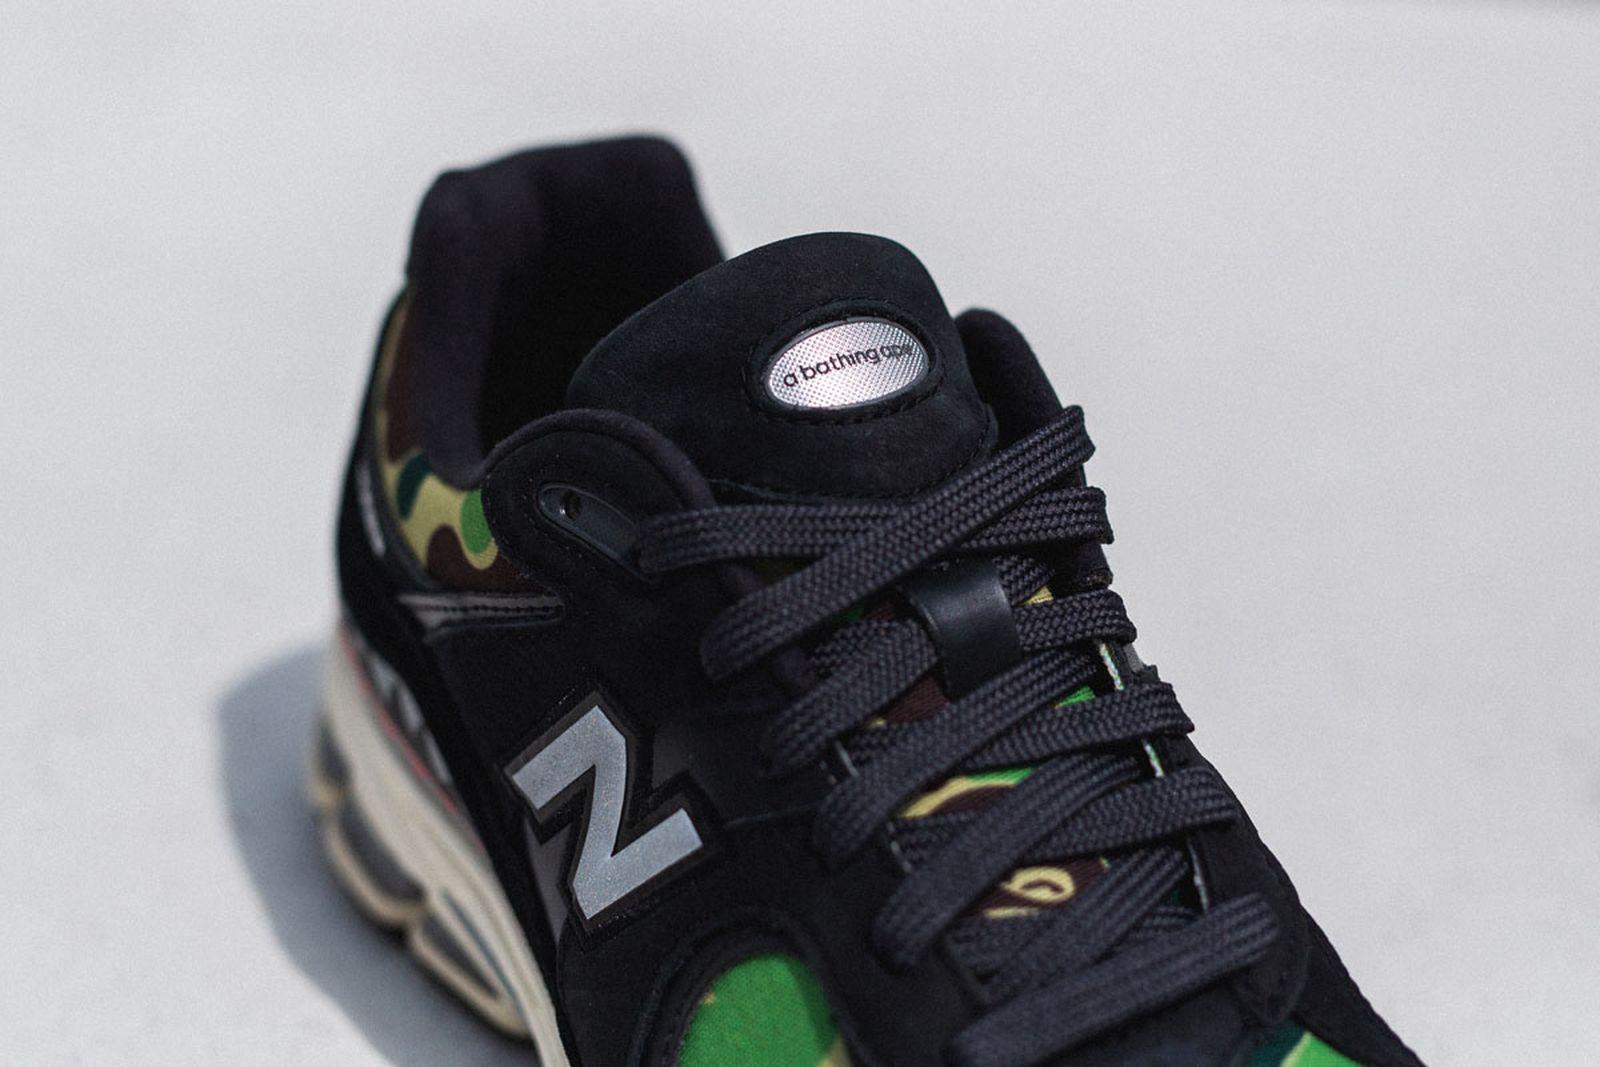 bape-new-balance-2002r-release-date-price-07